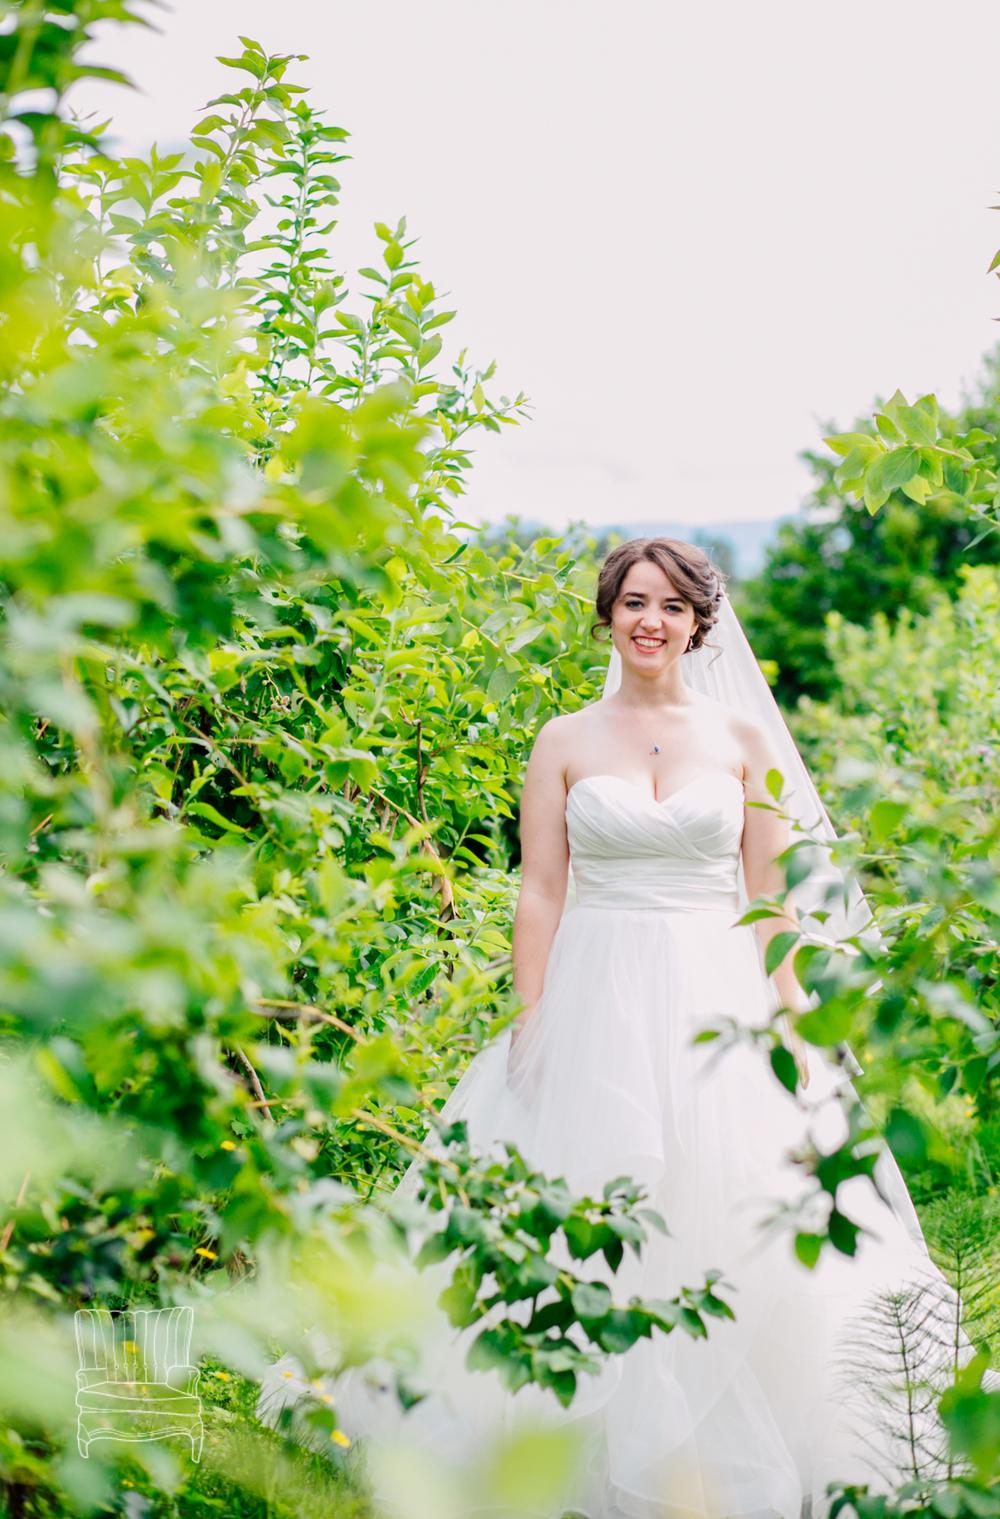 bybee-farms-north-bend-washington-wedding-allison-jon-35.jpg